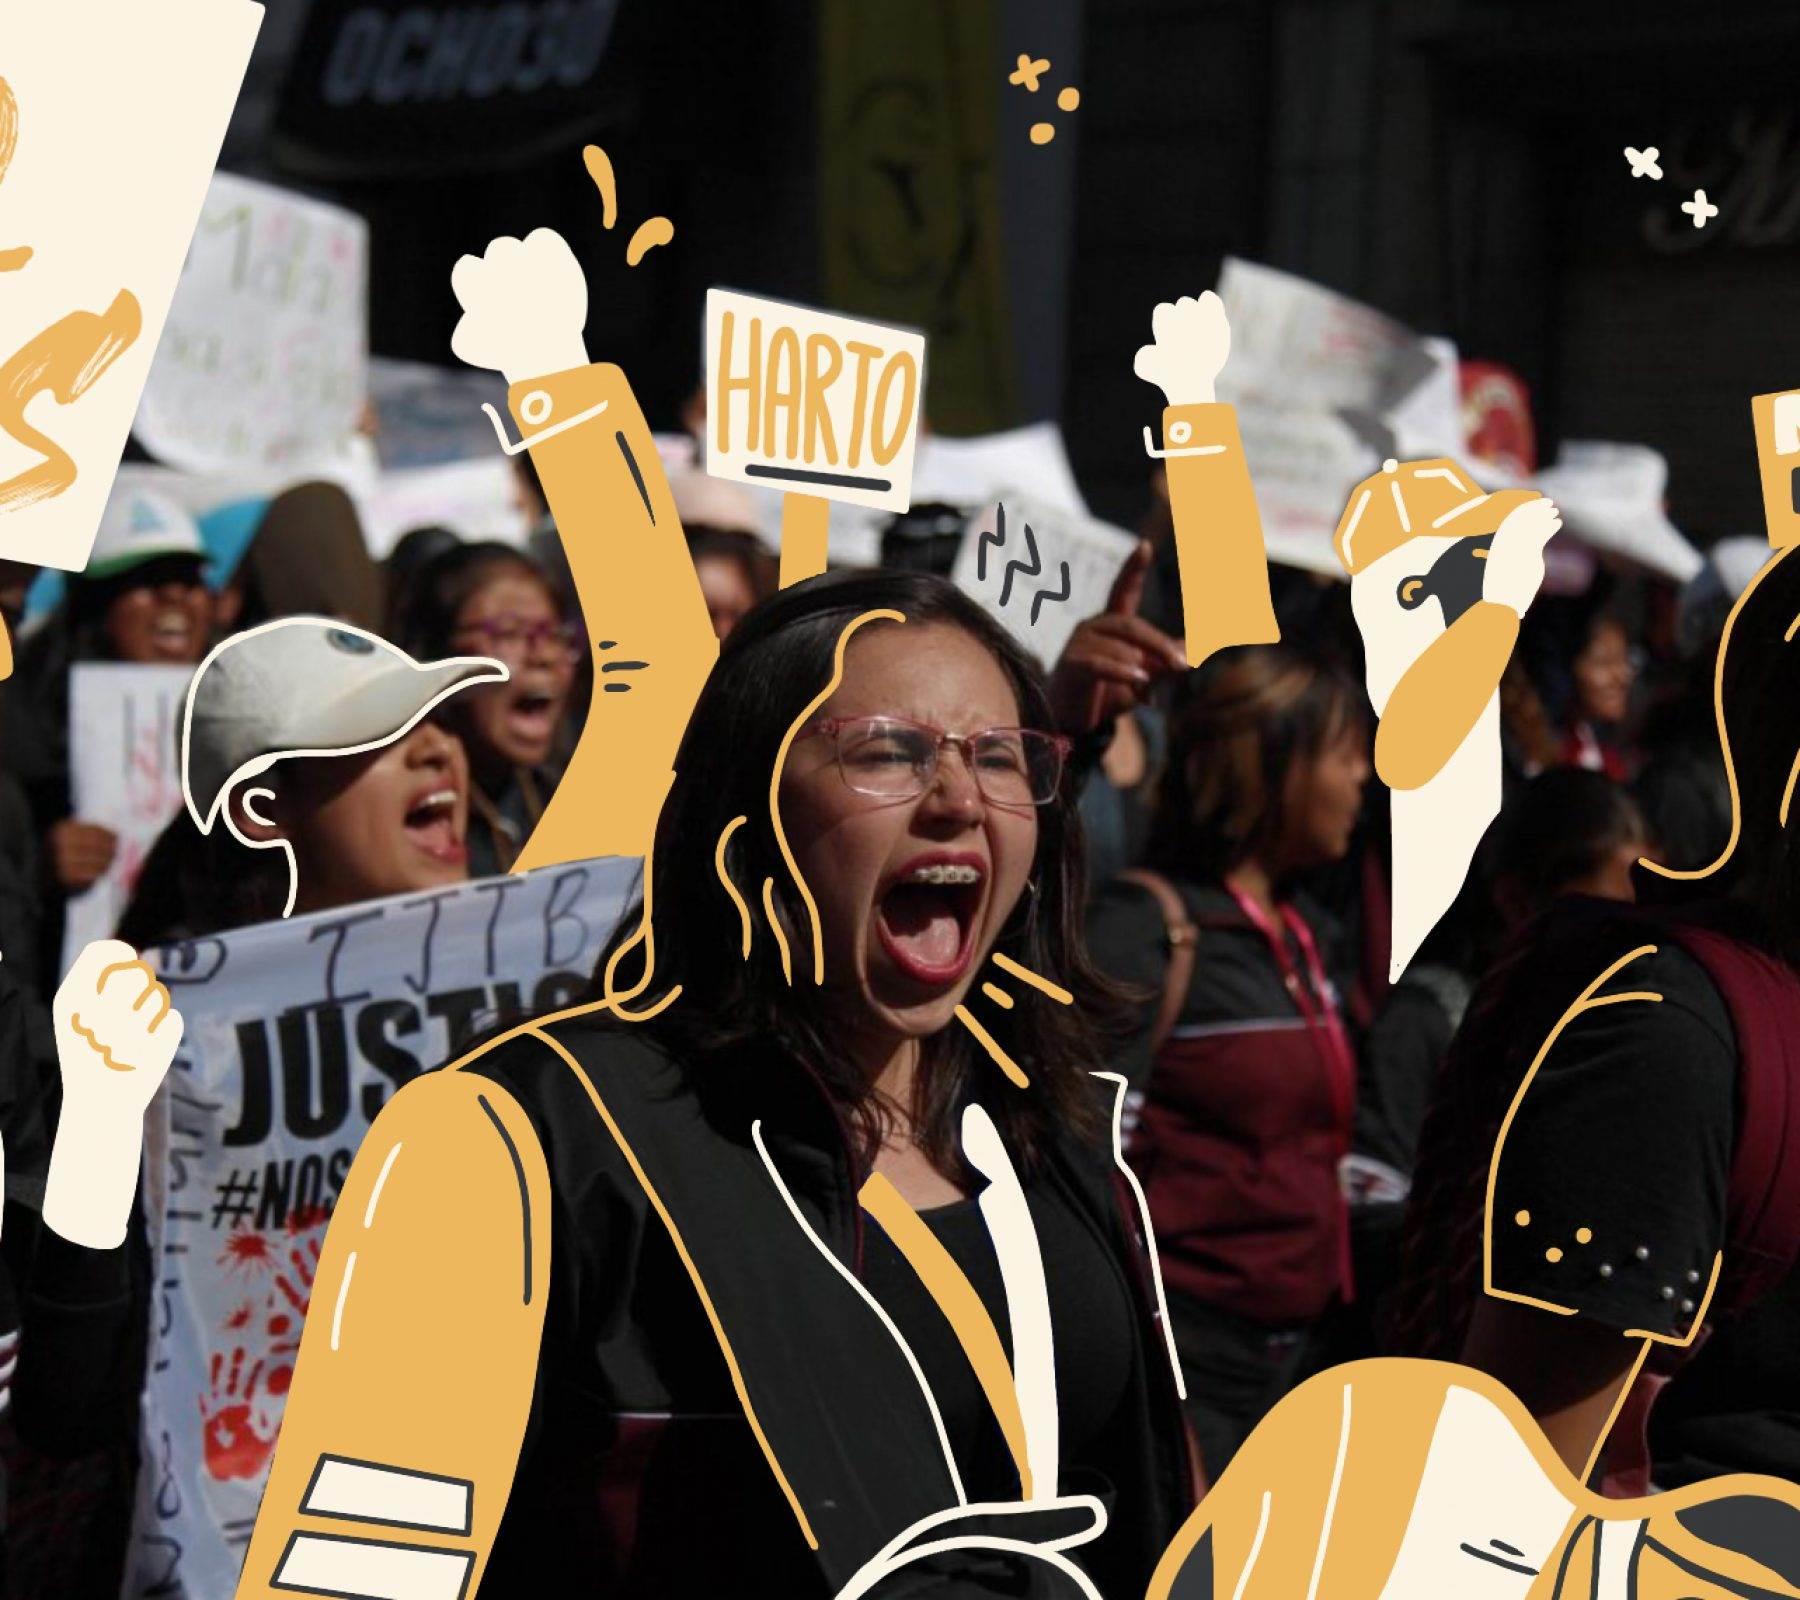 movimiento universitario megamarcha universitaria